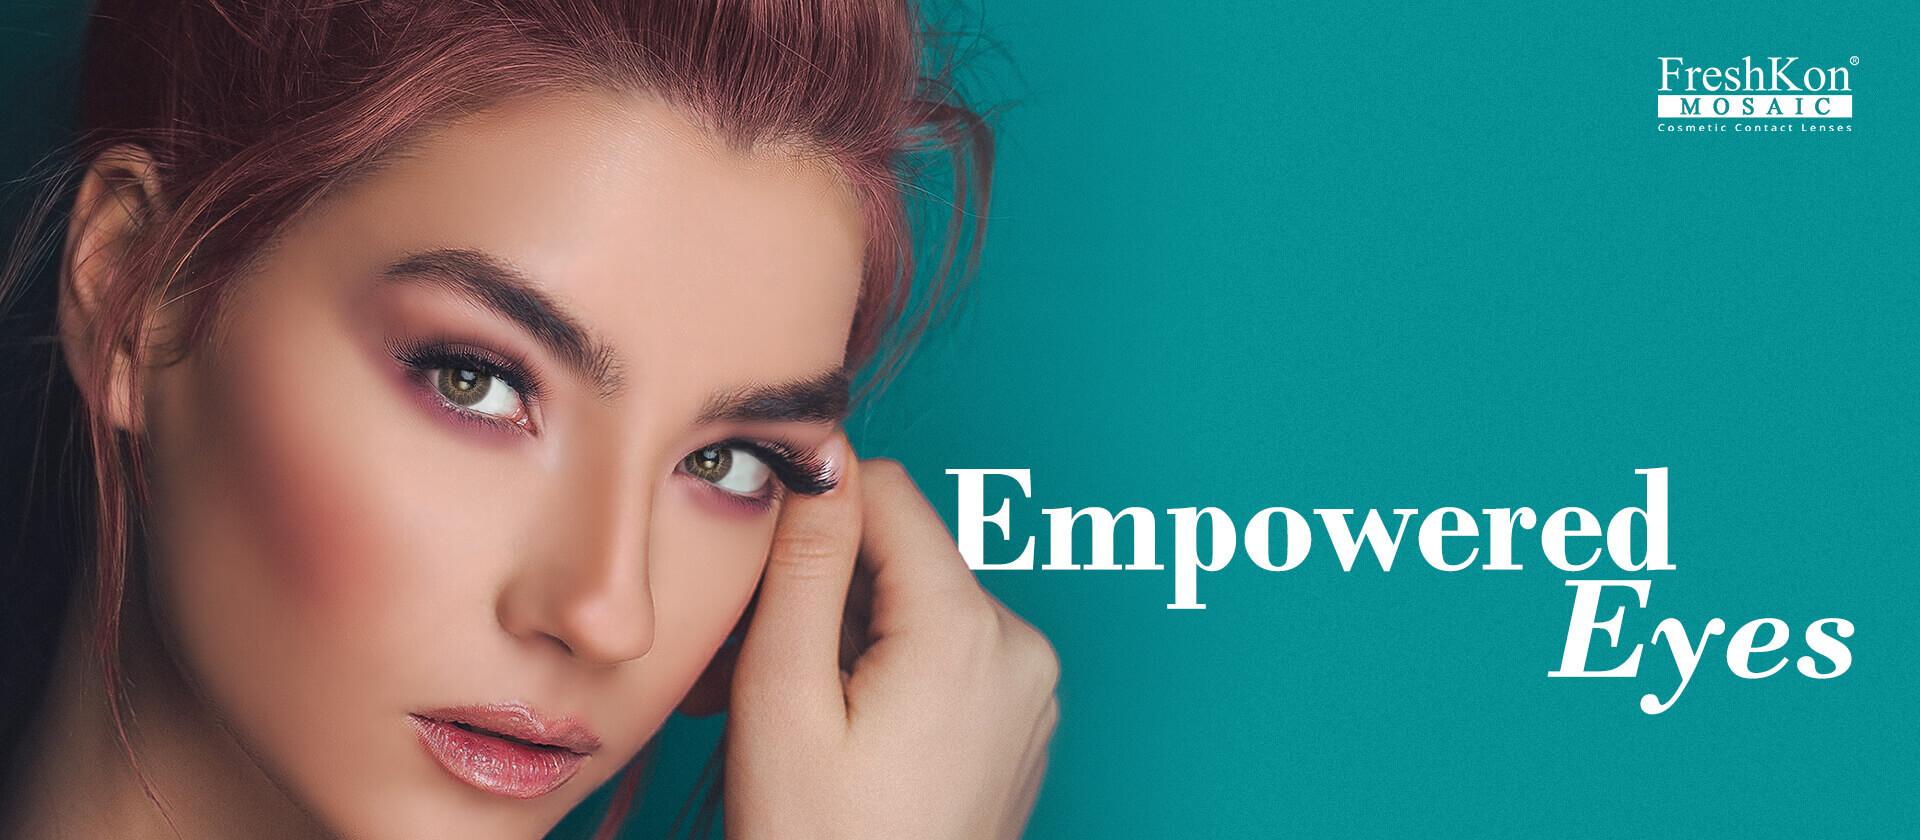 freshkon-empowered-eyes-banner